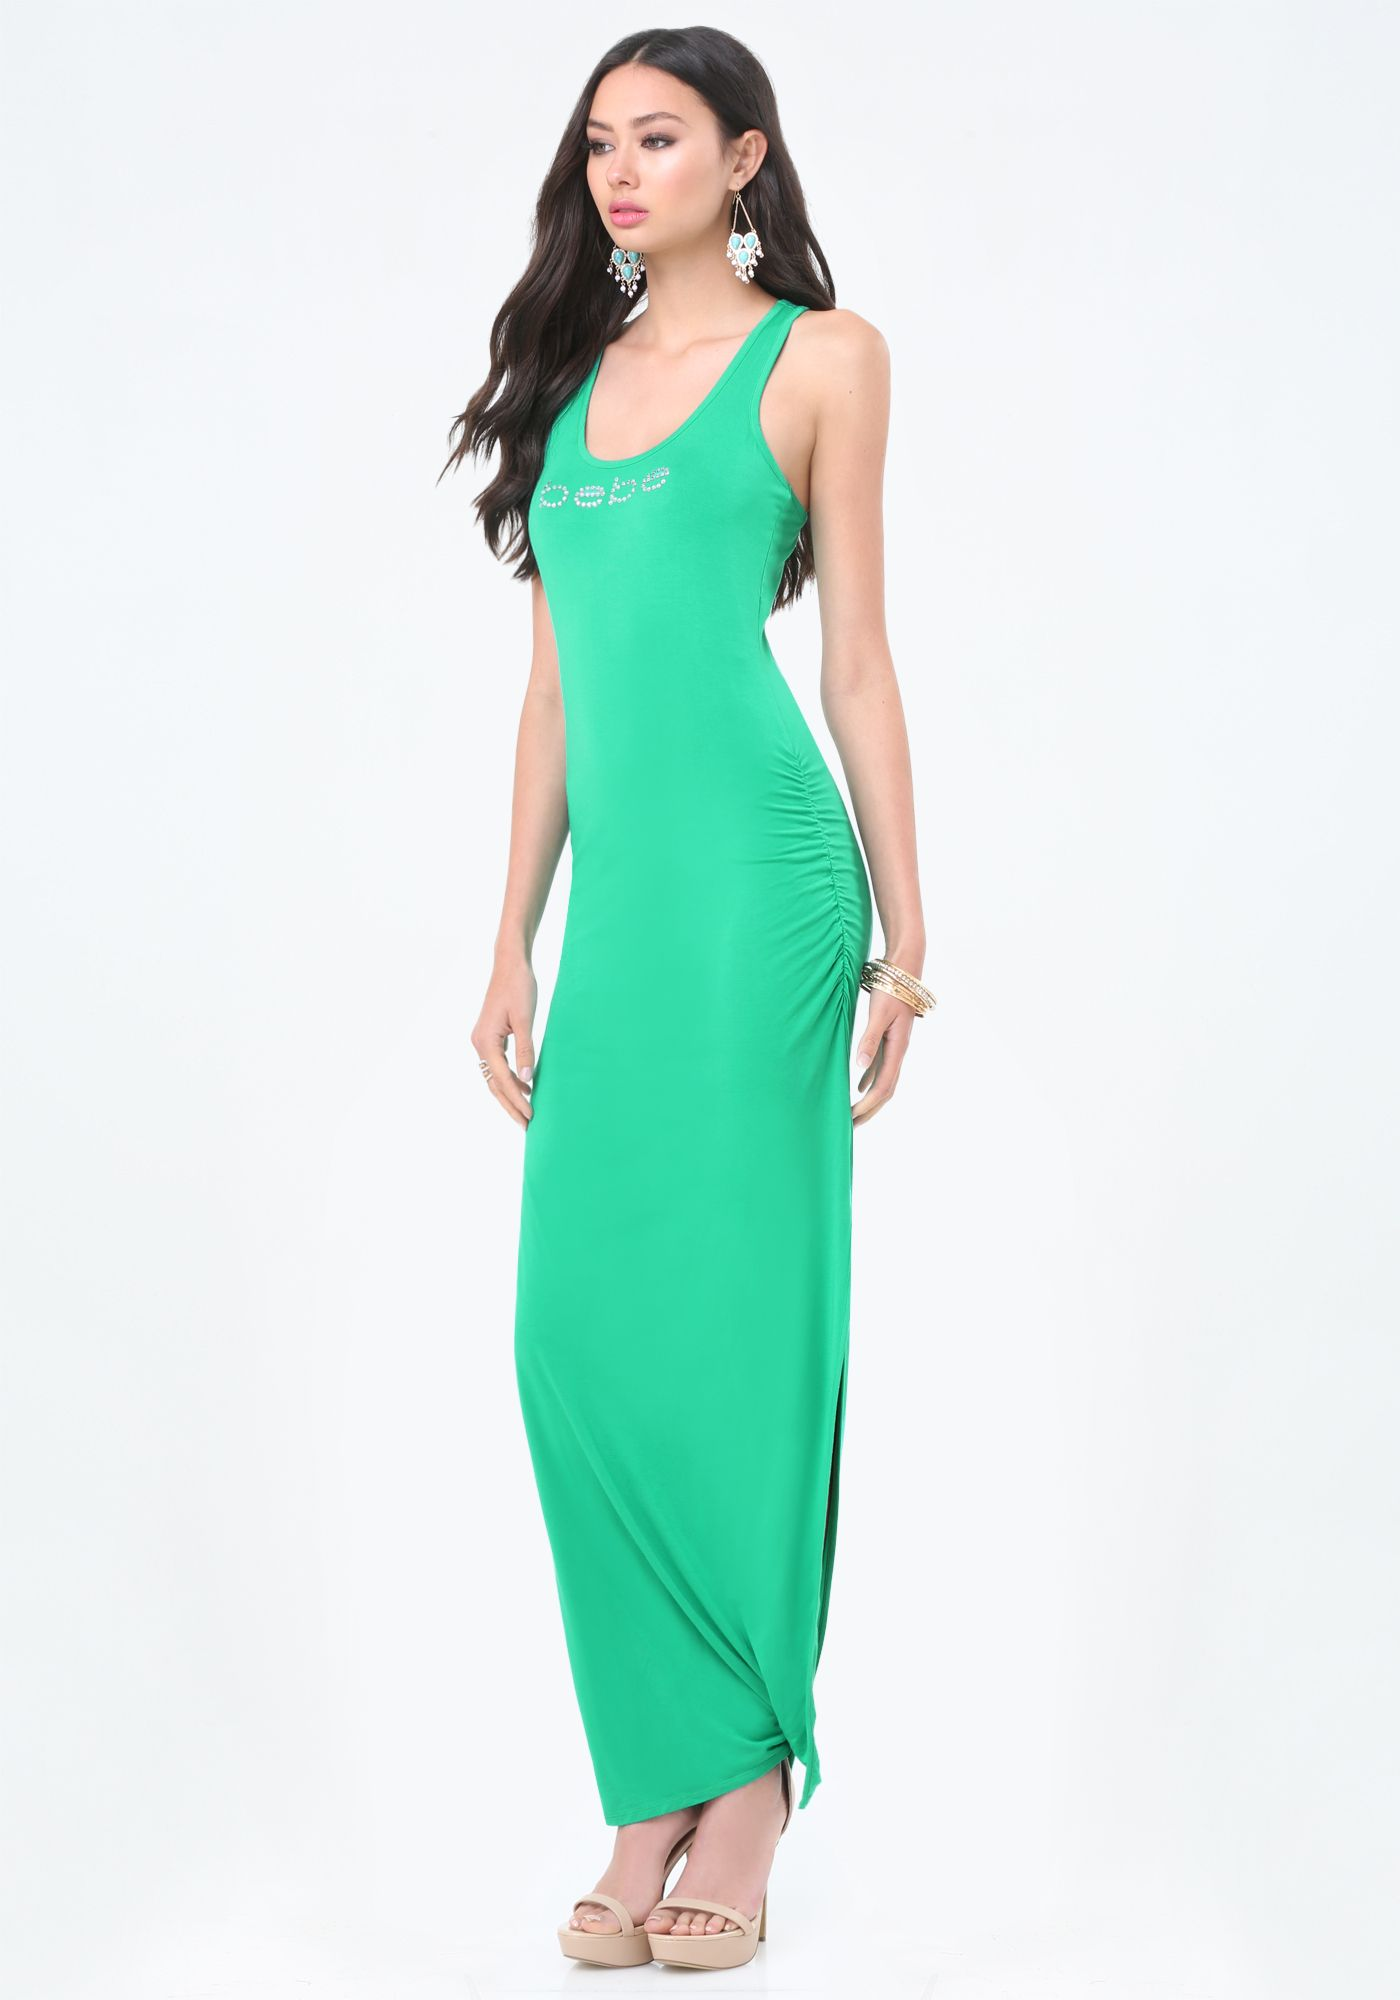 Bebe Shirred Tank Maxi Dress Bridget Hollitt 265005 Paa Flowy Maxi Dress Maxi Tank Dress Dresses [ 2000 x 1400 Pixel ]